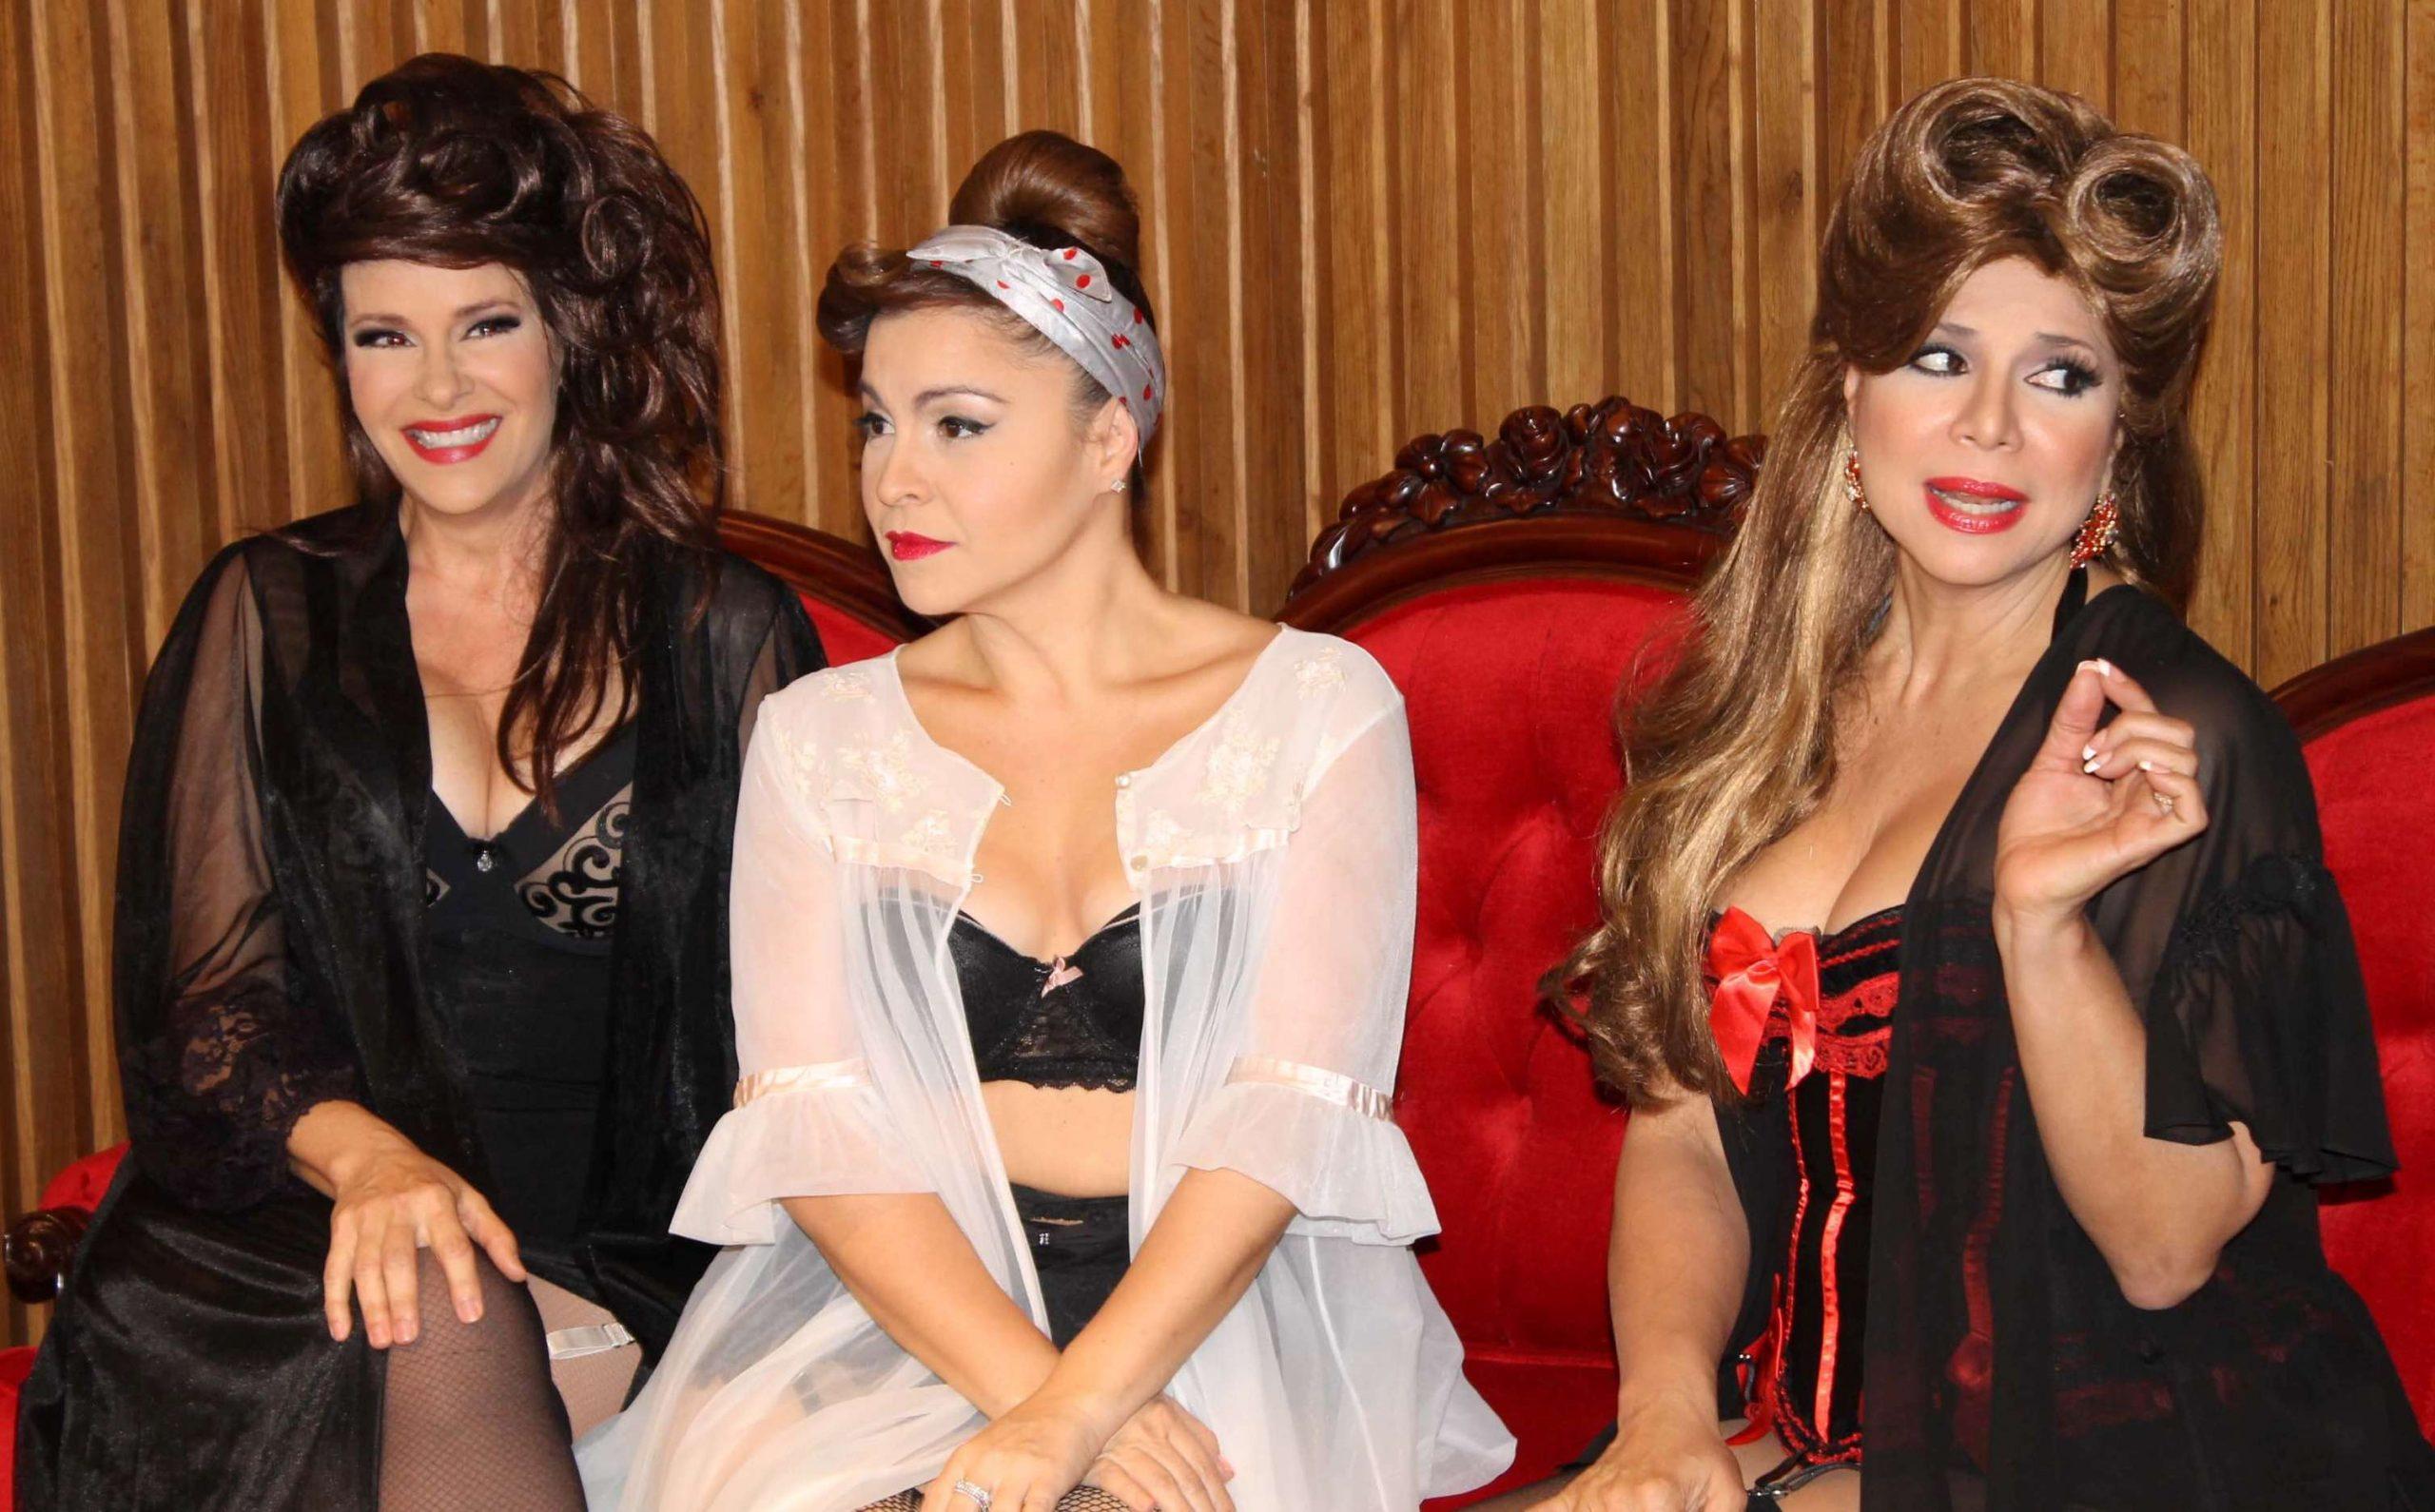 Cristina Soler, Wanda Sais y Linnette Torres - Copy